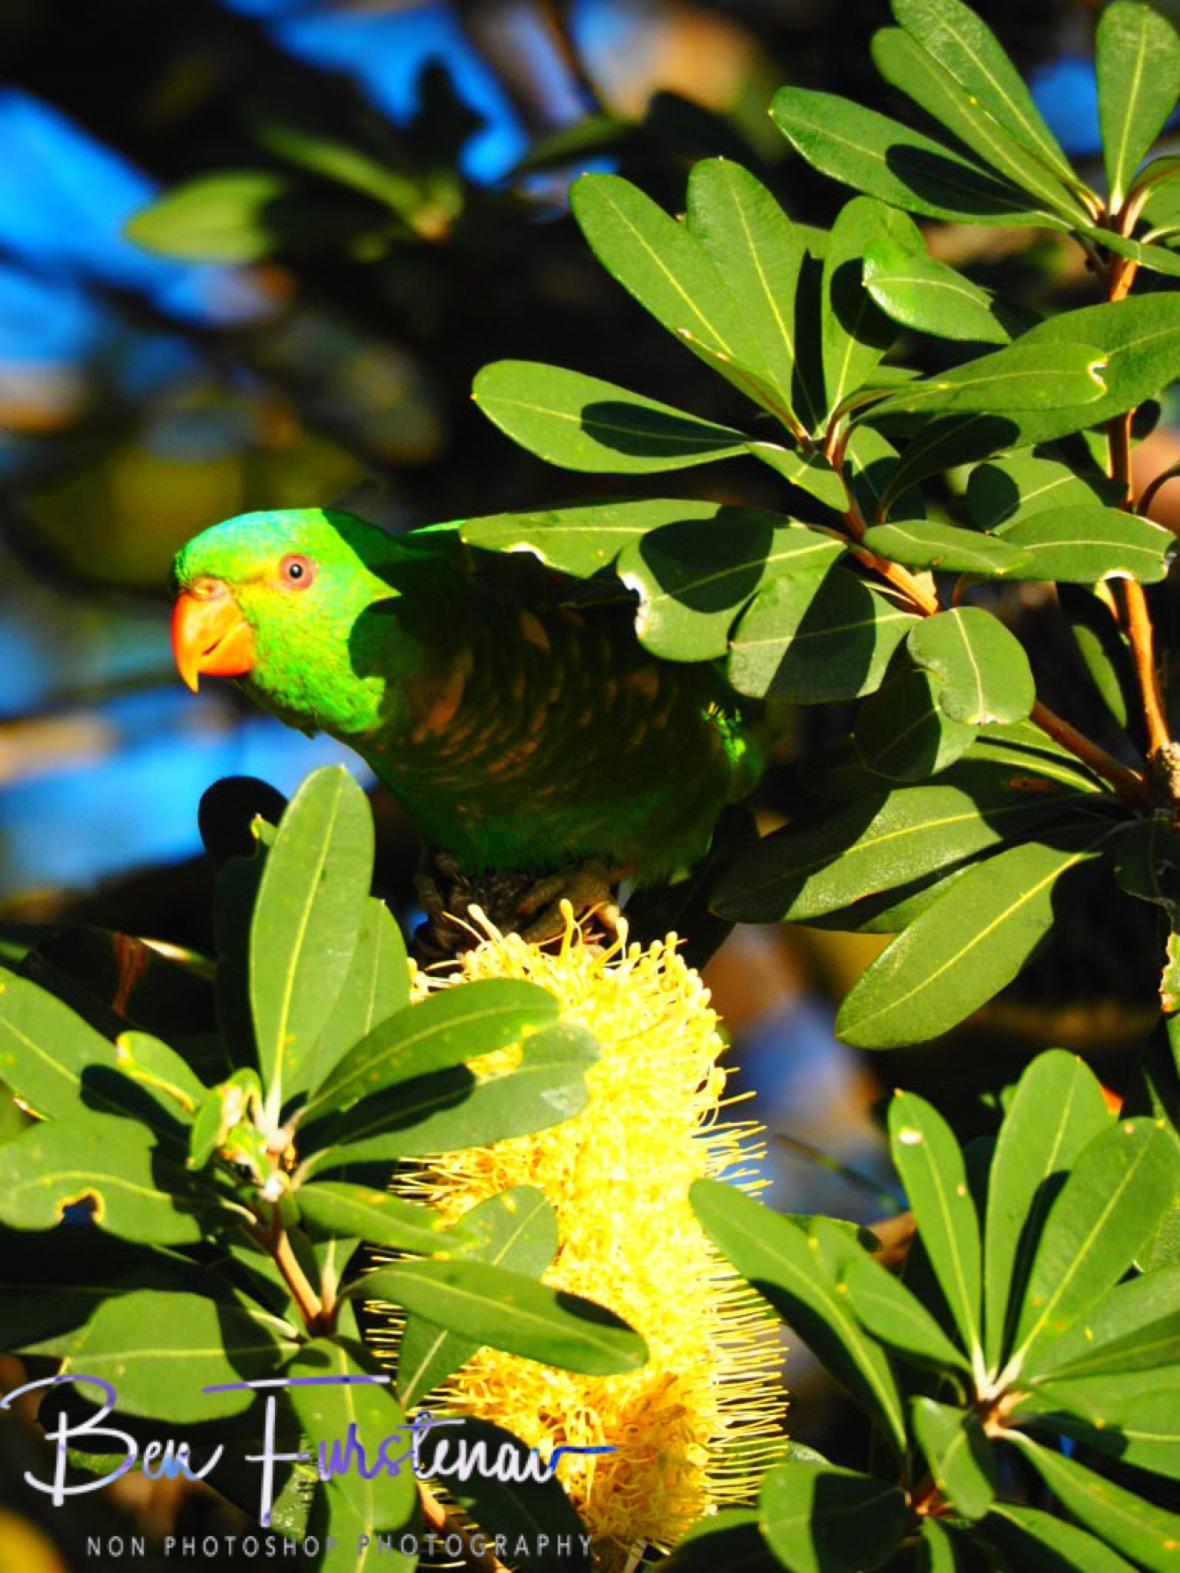 Beakaboo @ Crowdy Head, Northern New South Wales, Australia